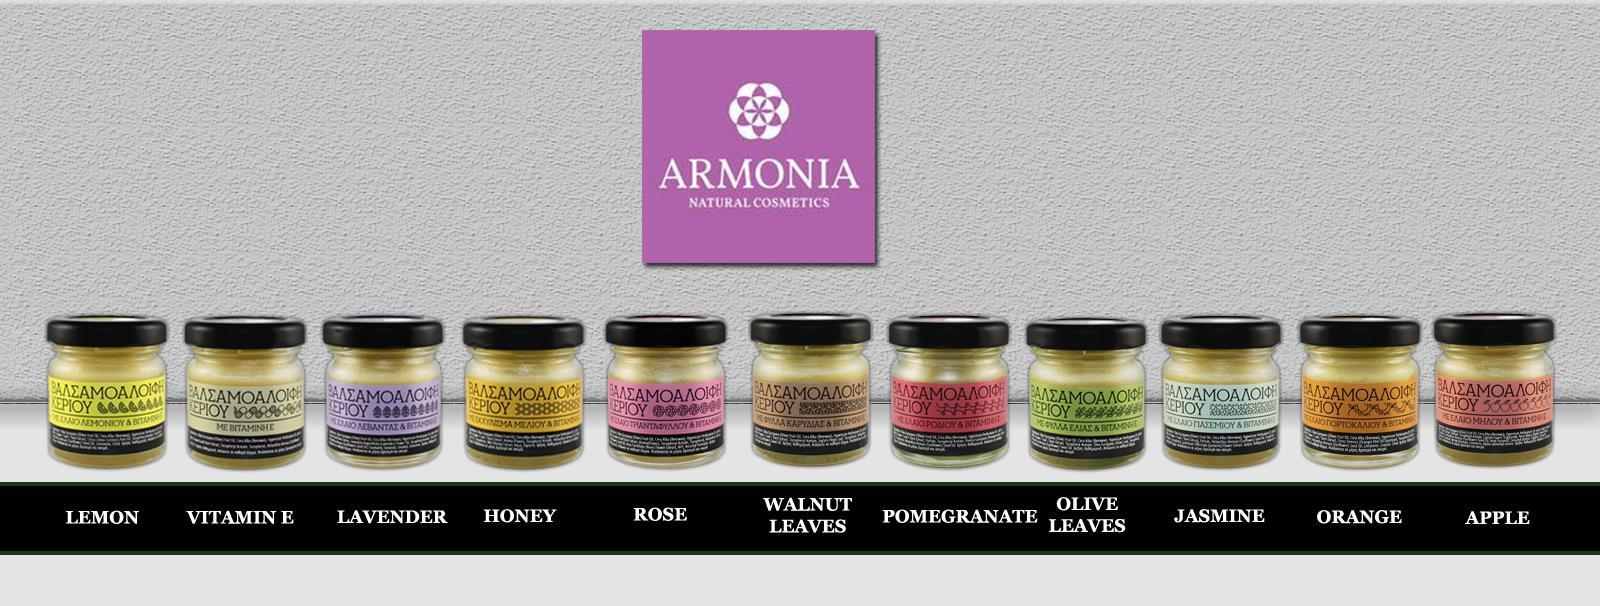 Natural Cosmetics St. John's Wort Oil Wax Creams Balm Organic Olive Oil